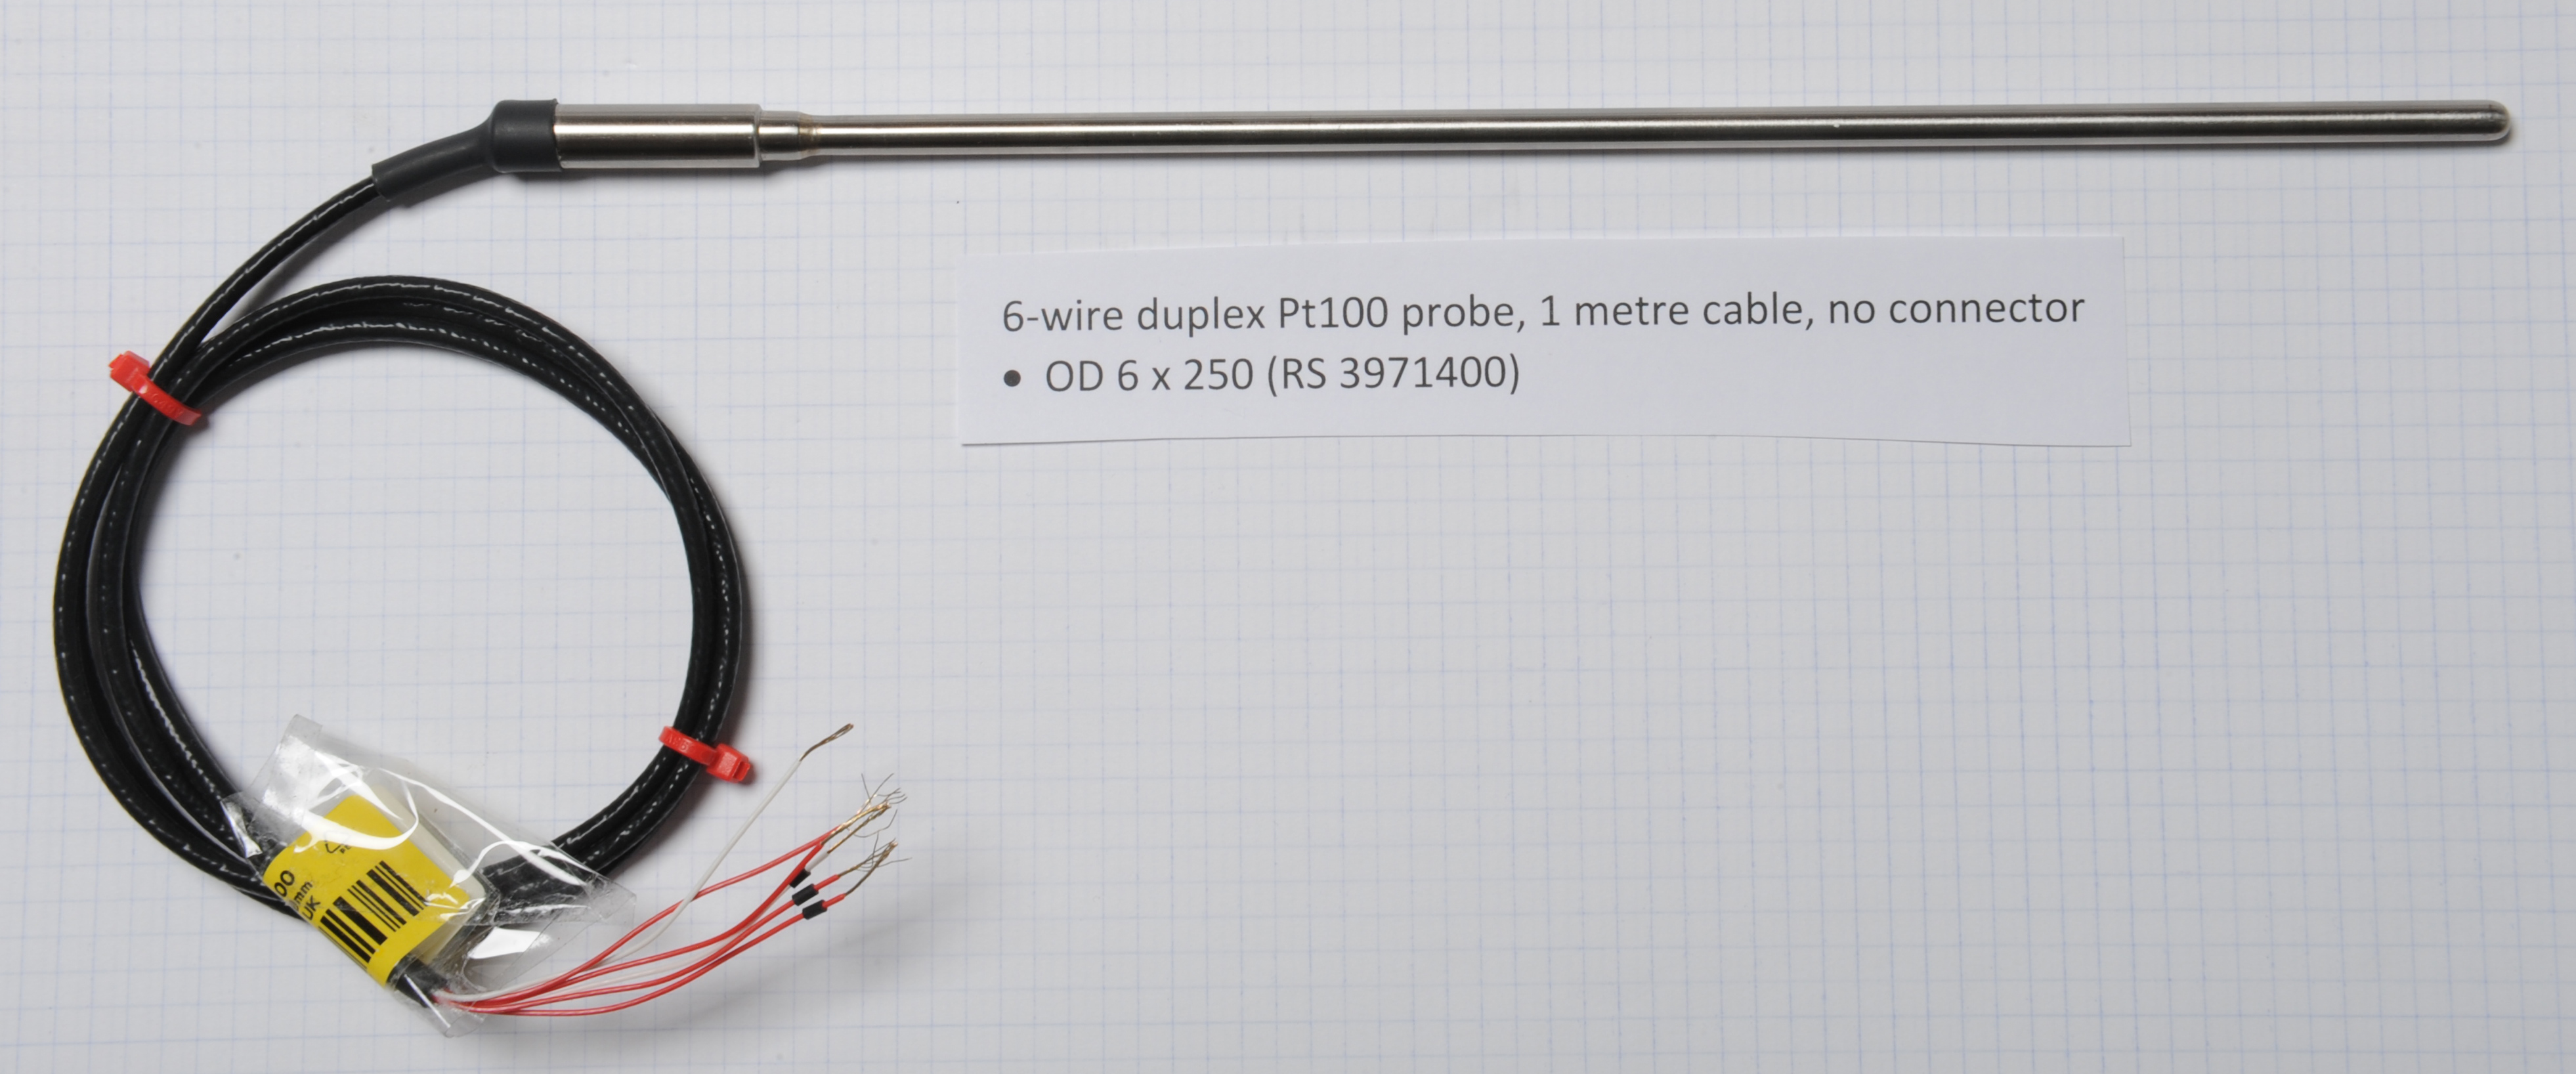 Omega Rtd Wiring Diagram